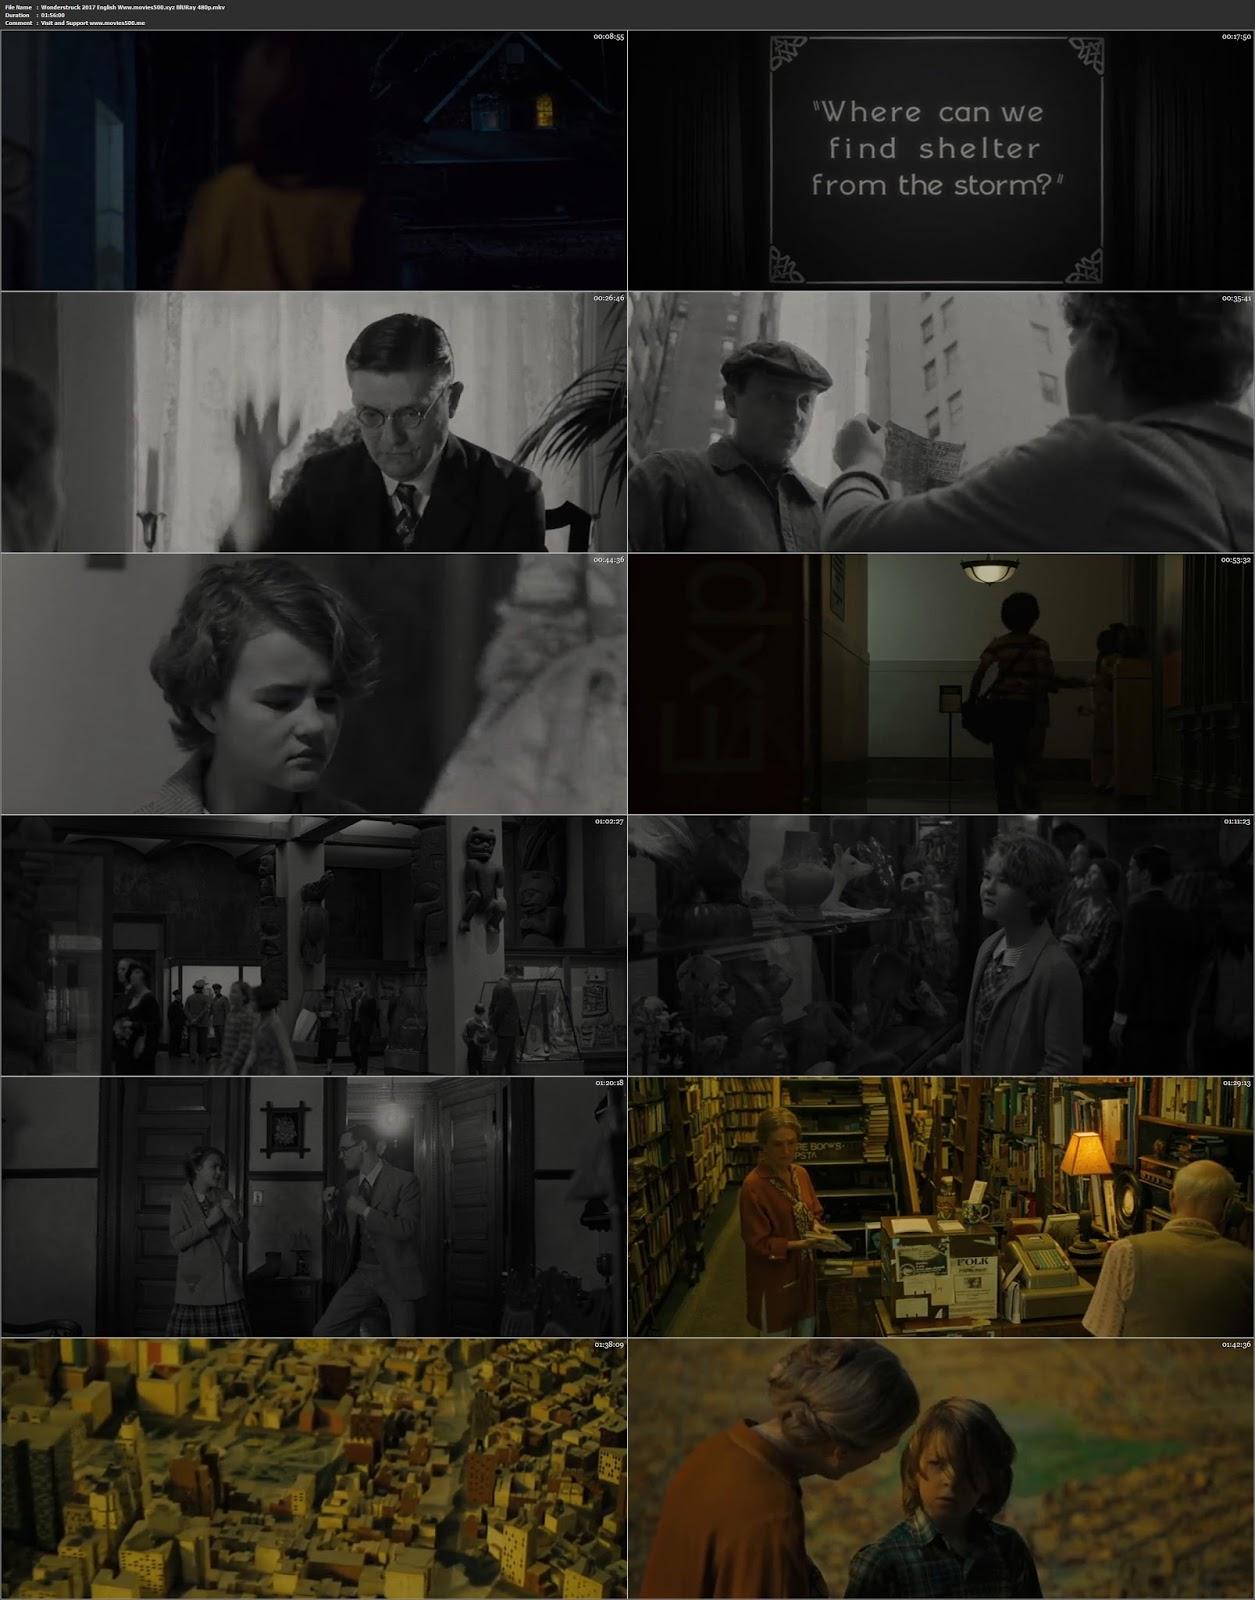 Wonderstruck 2017 Hollywood 300MB BluRay 480p ESubs at 9966132.com